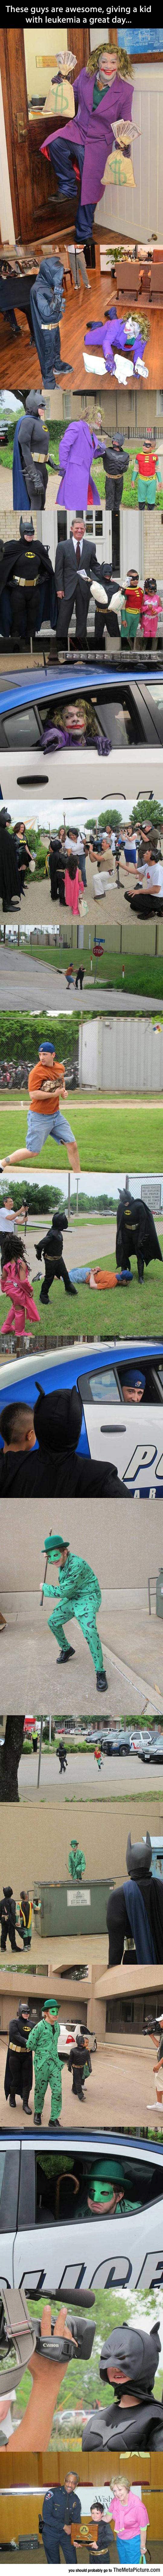 cute-Batman-leukemia-kid-Joker